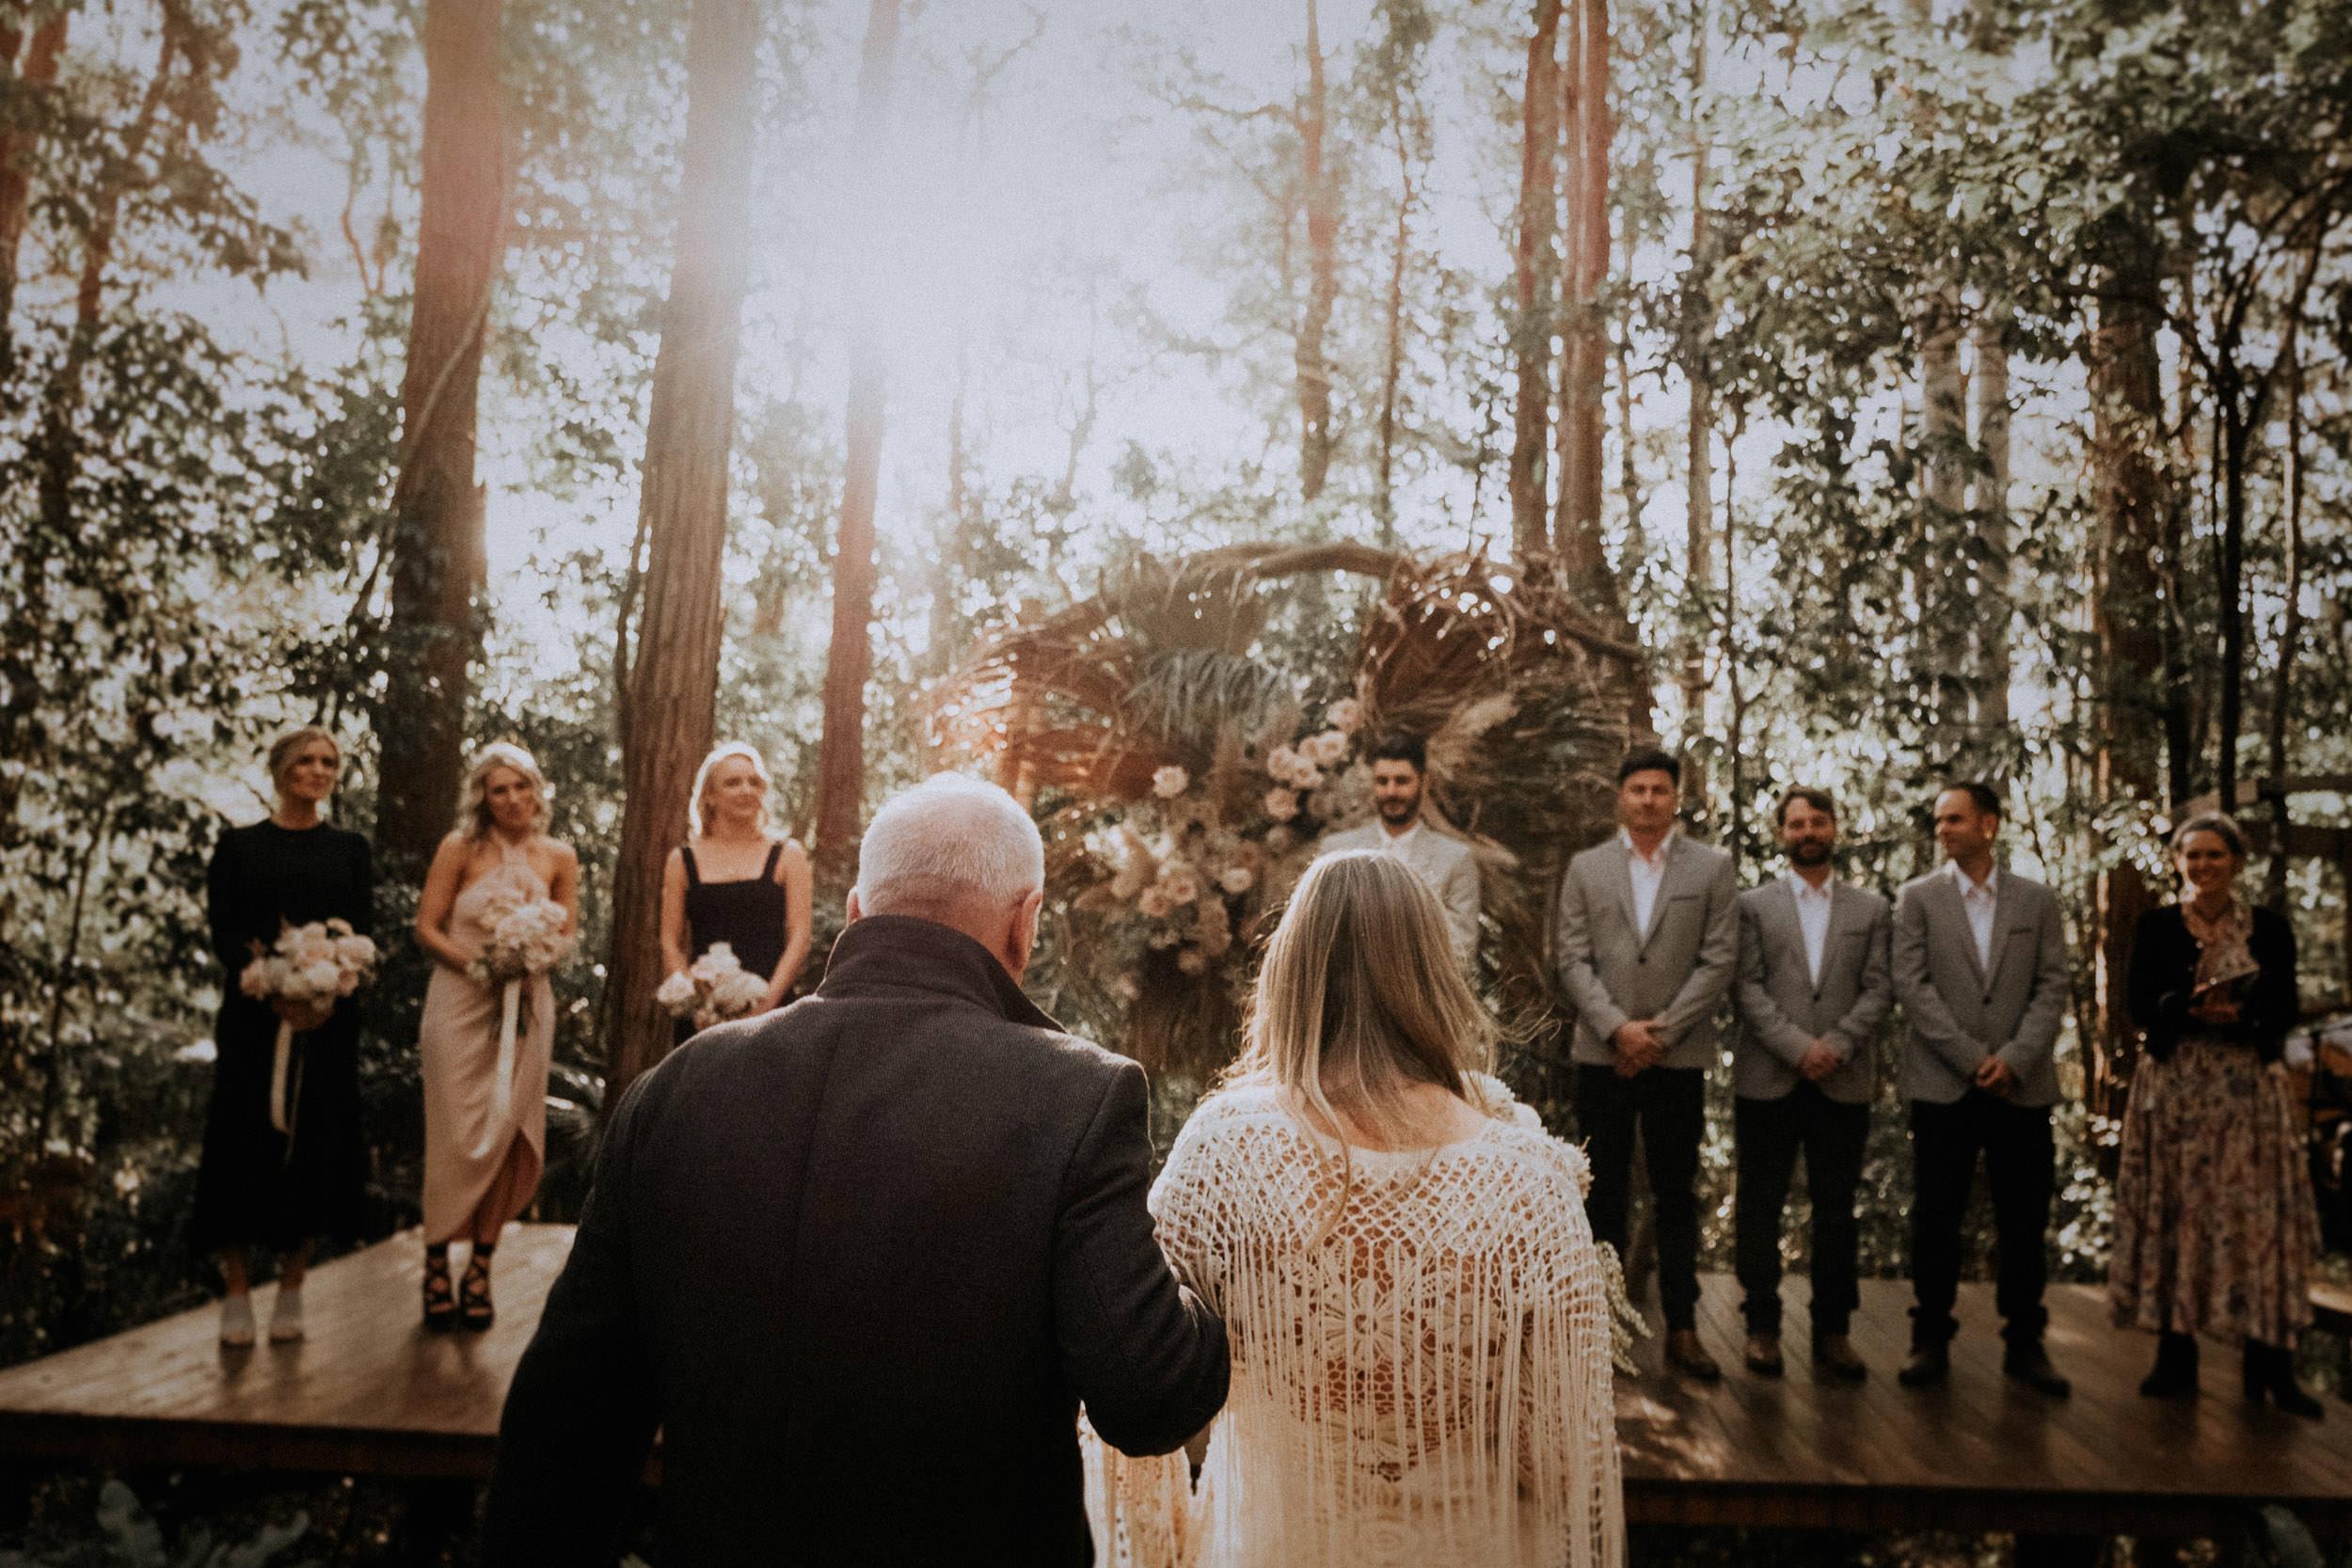 S&A Elopement - Kings & Thieves - Shred 'Til Dead - Central Coast Beach Forest Wedding - 169.jpg